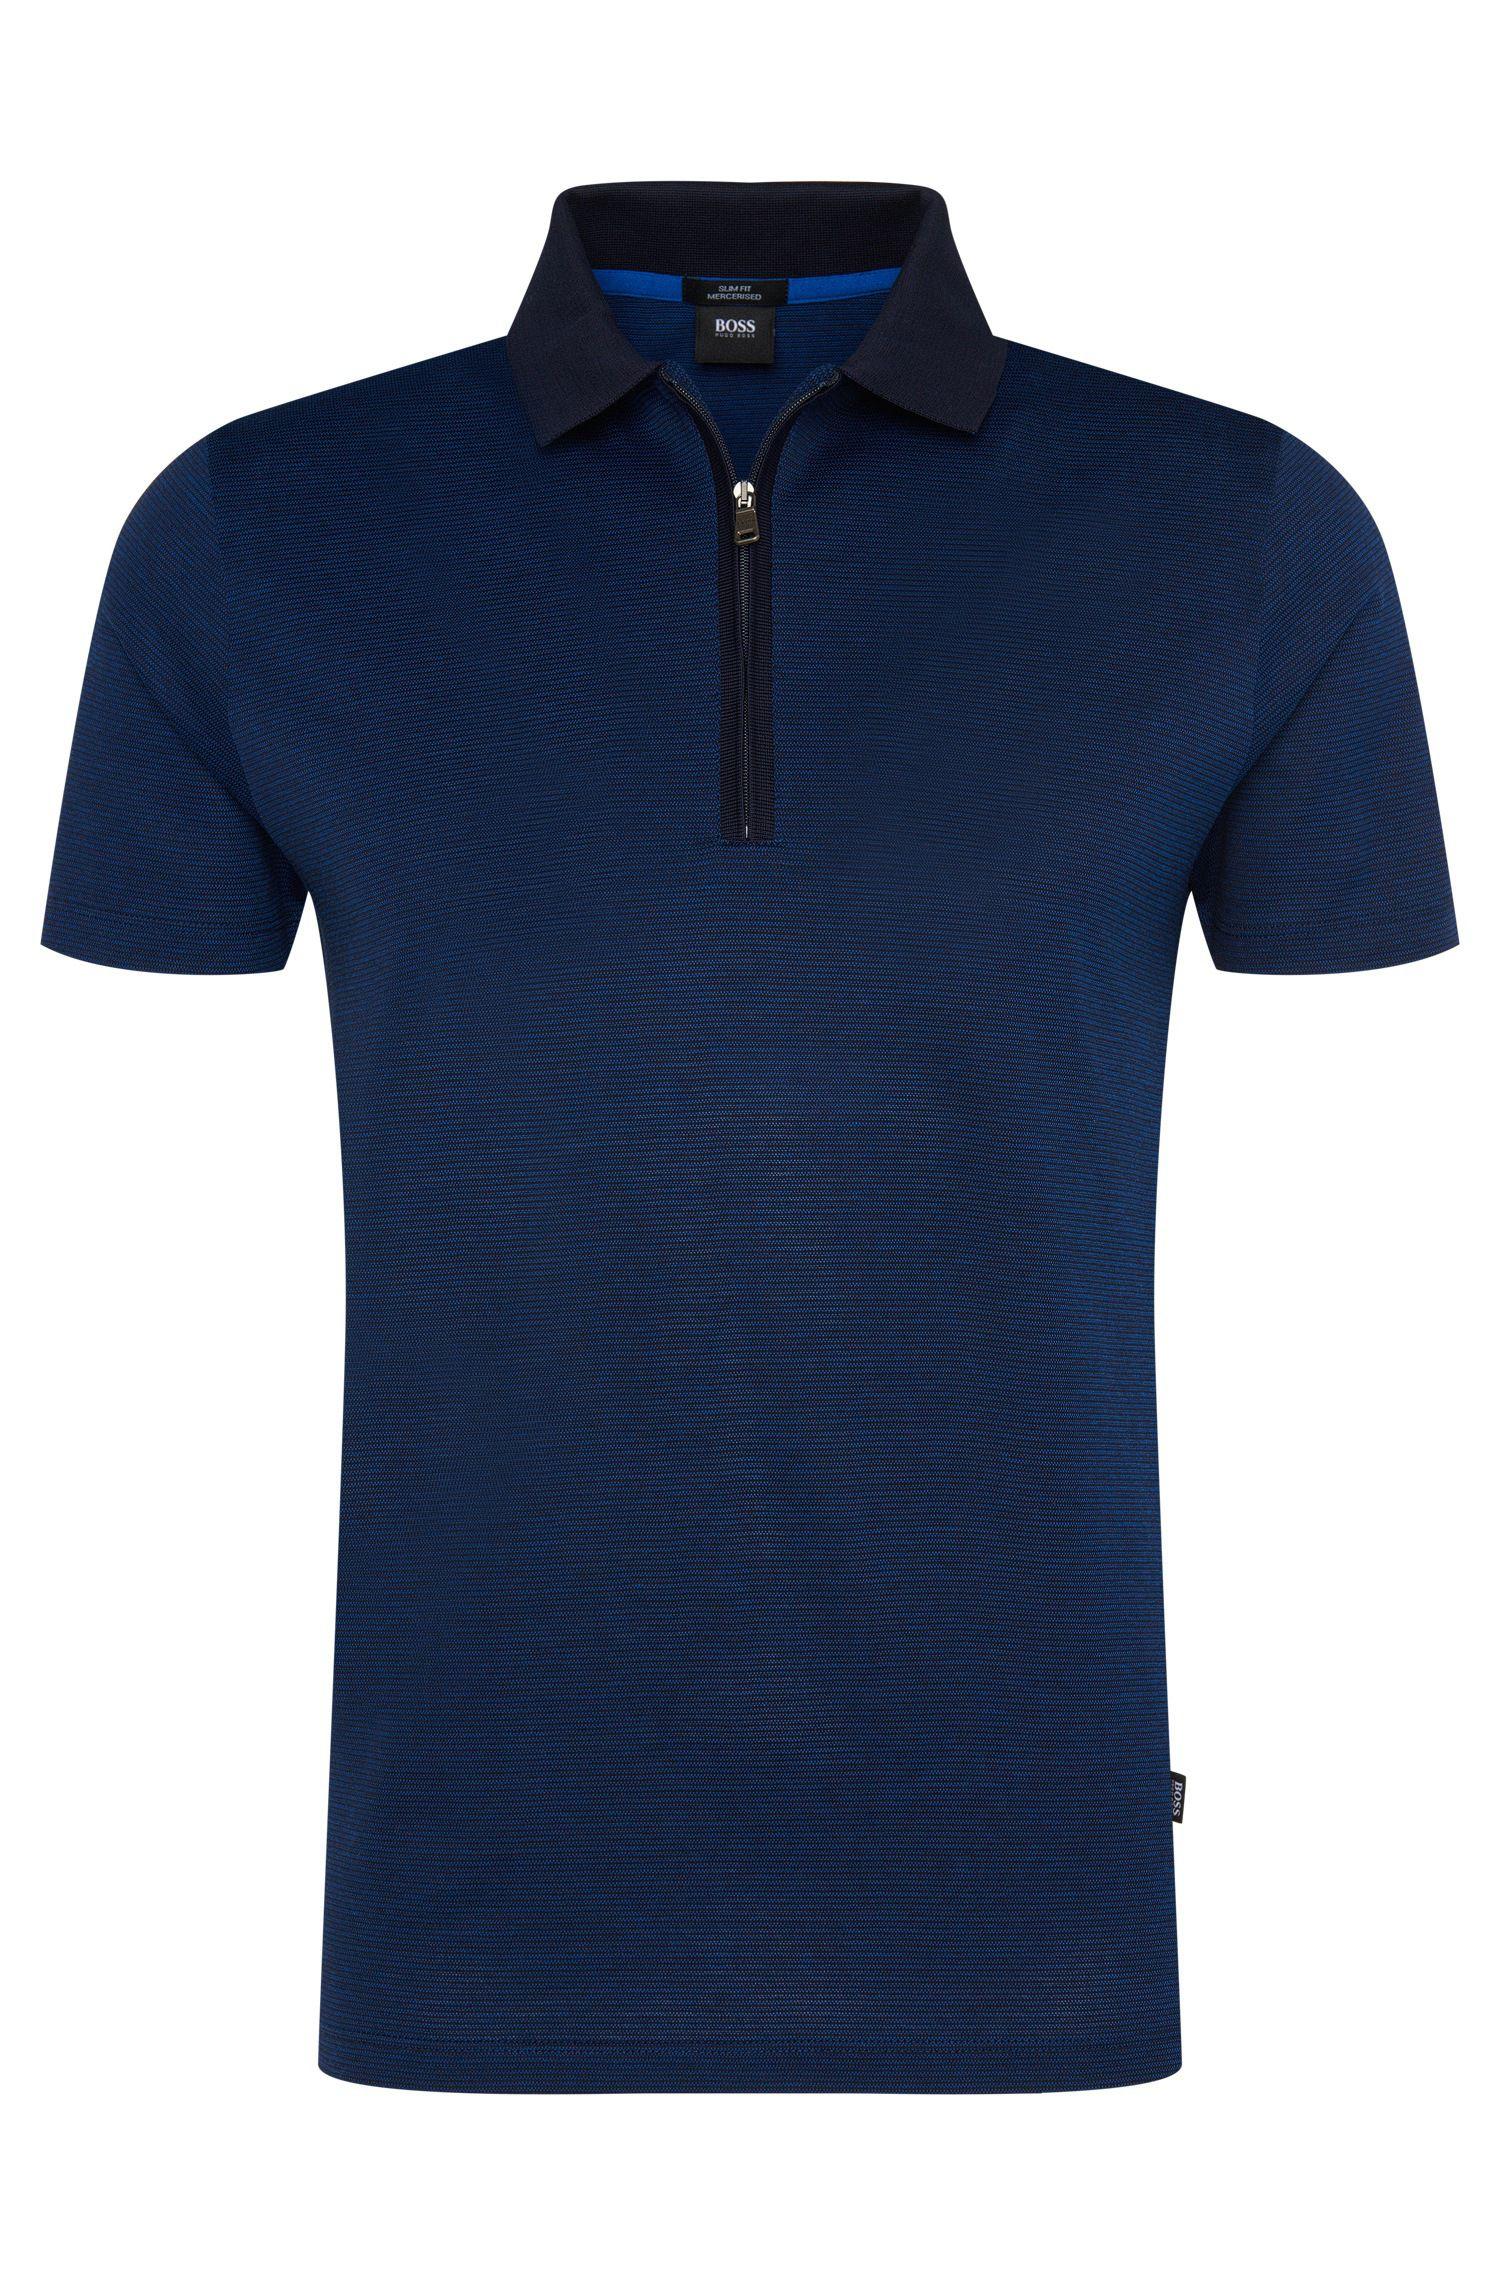 'Polston' | Slim Fit, Mercerized Cotton Zip Polo Shirt